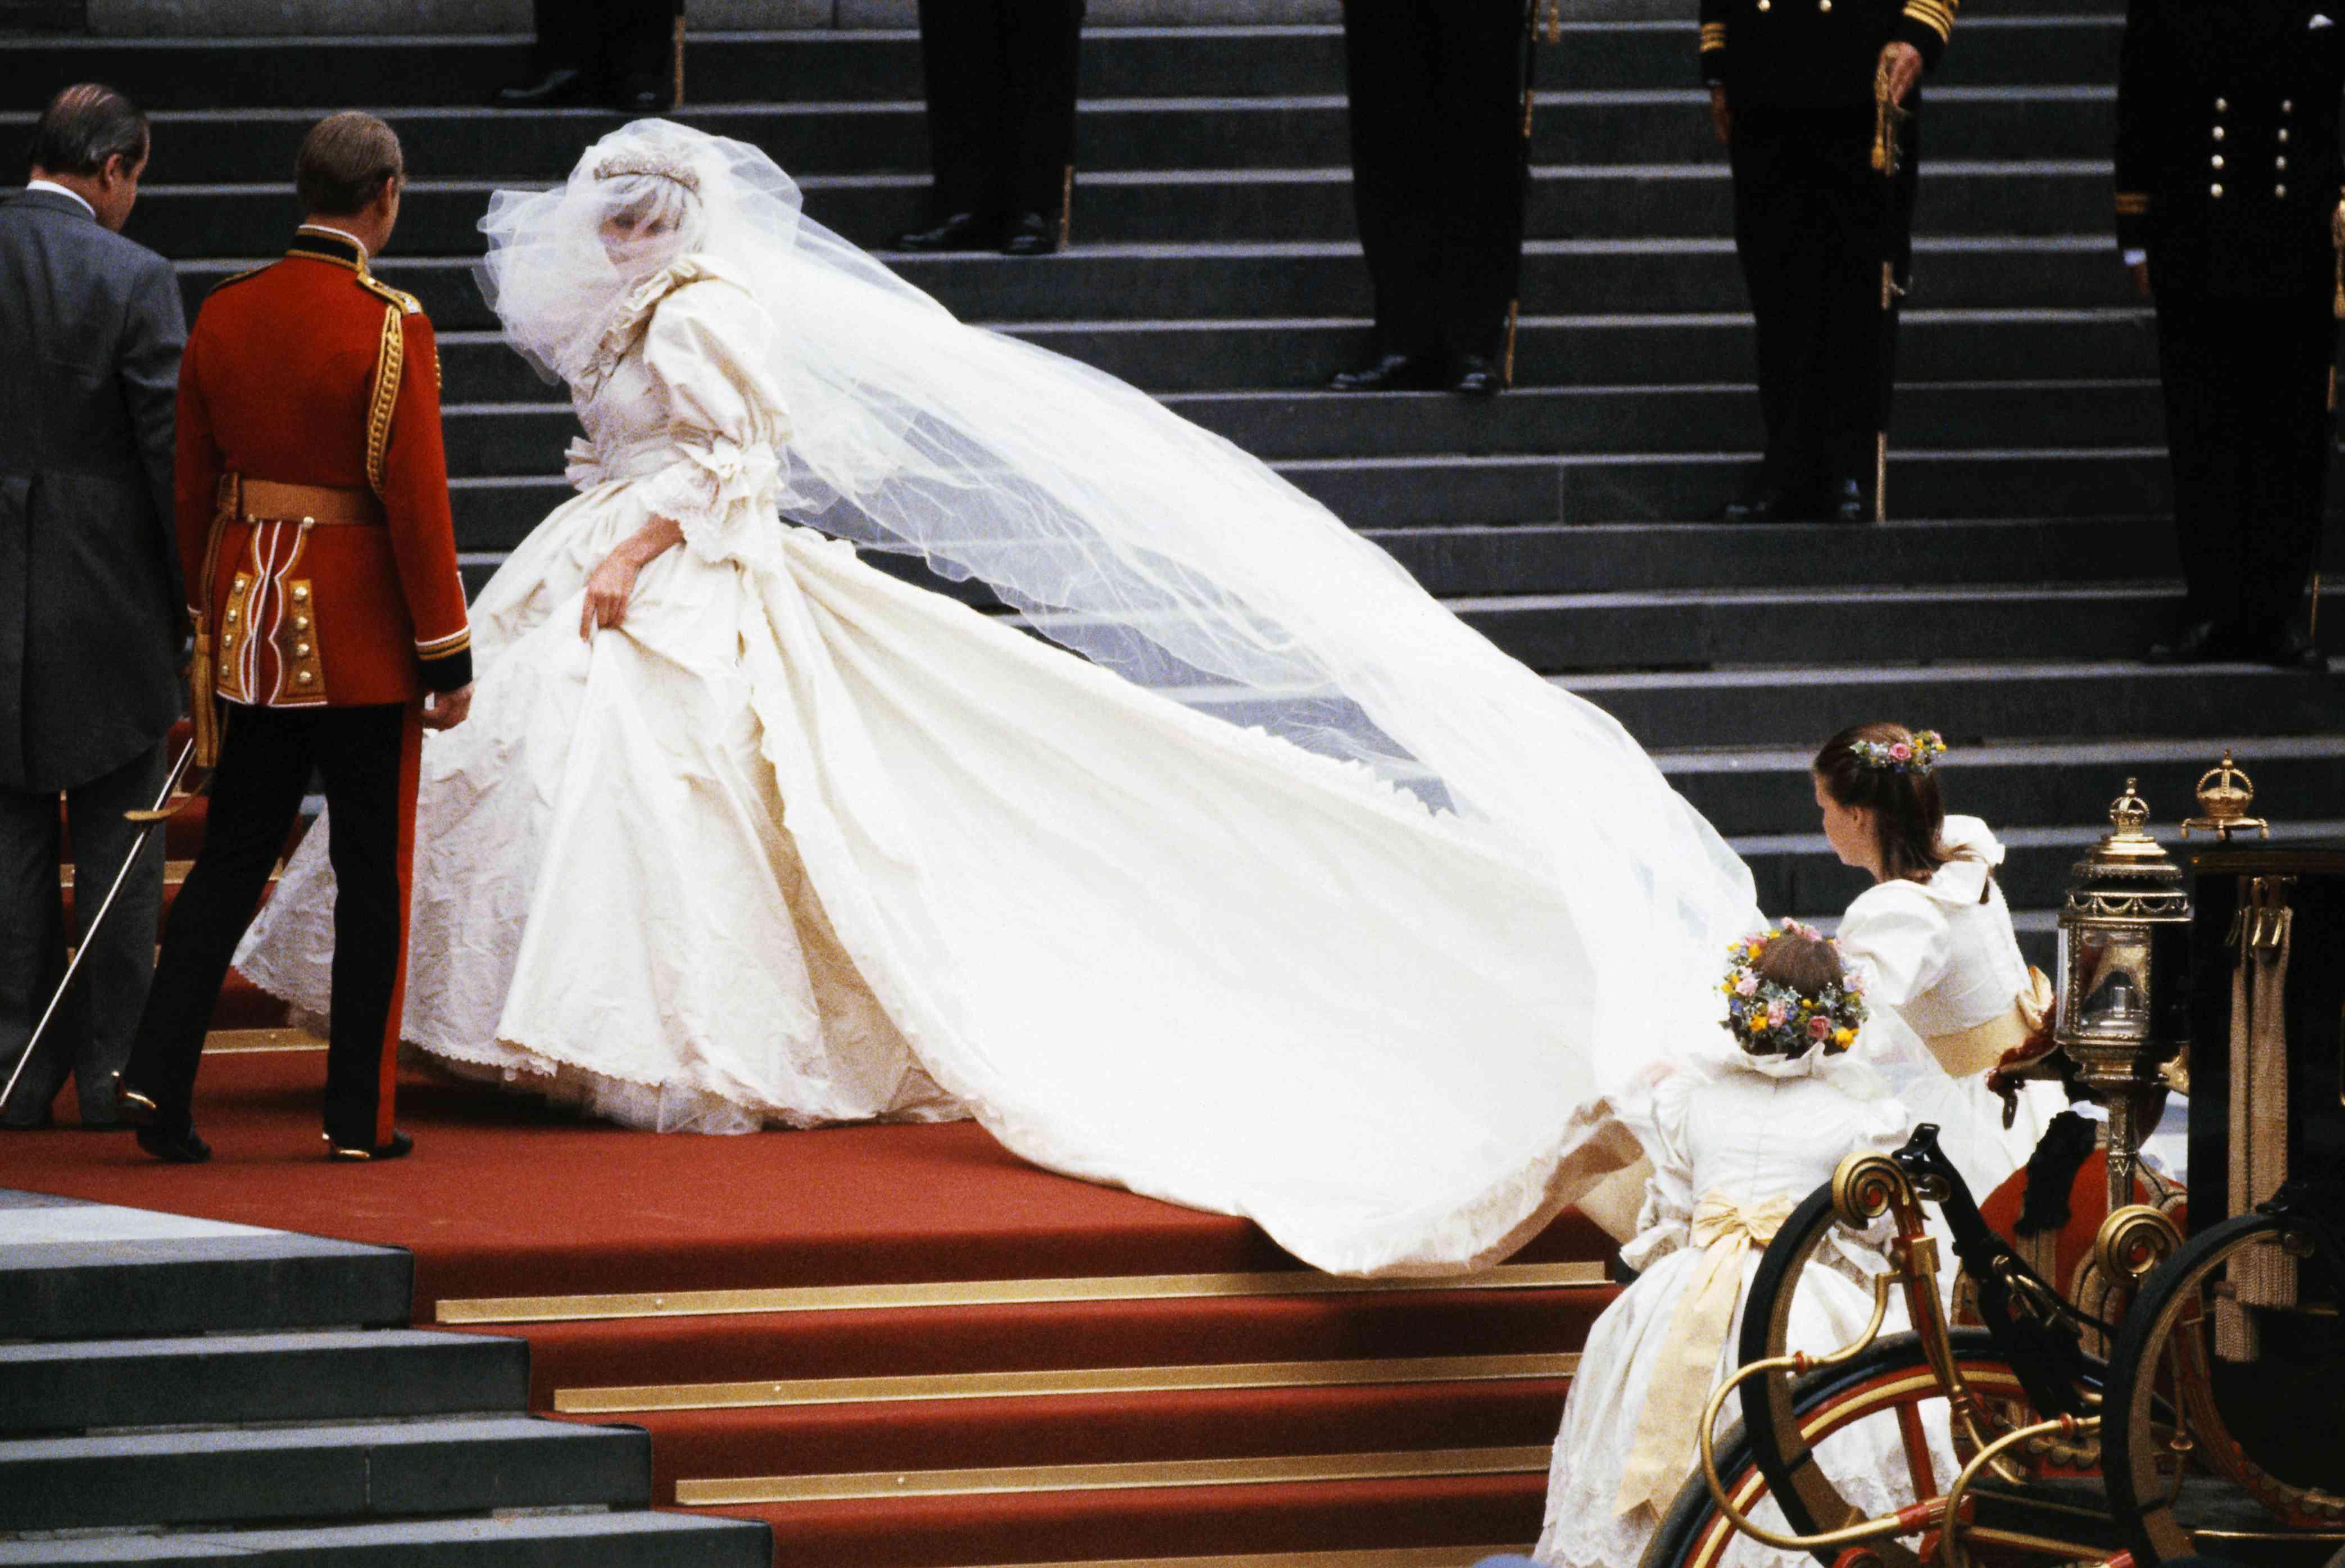 Diana Wedding Dress.Happy Birthday Princess Diana The Most Iconic Celebrity Bride